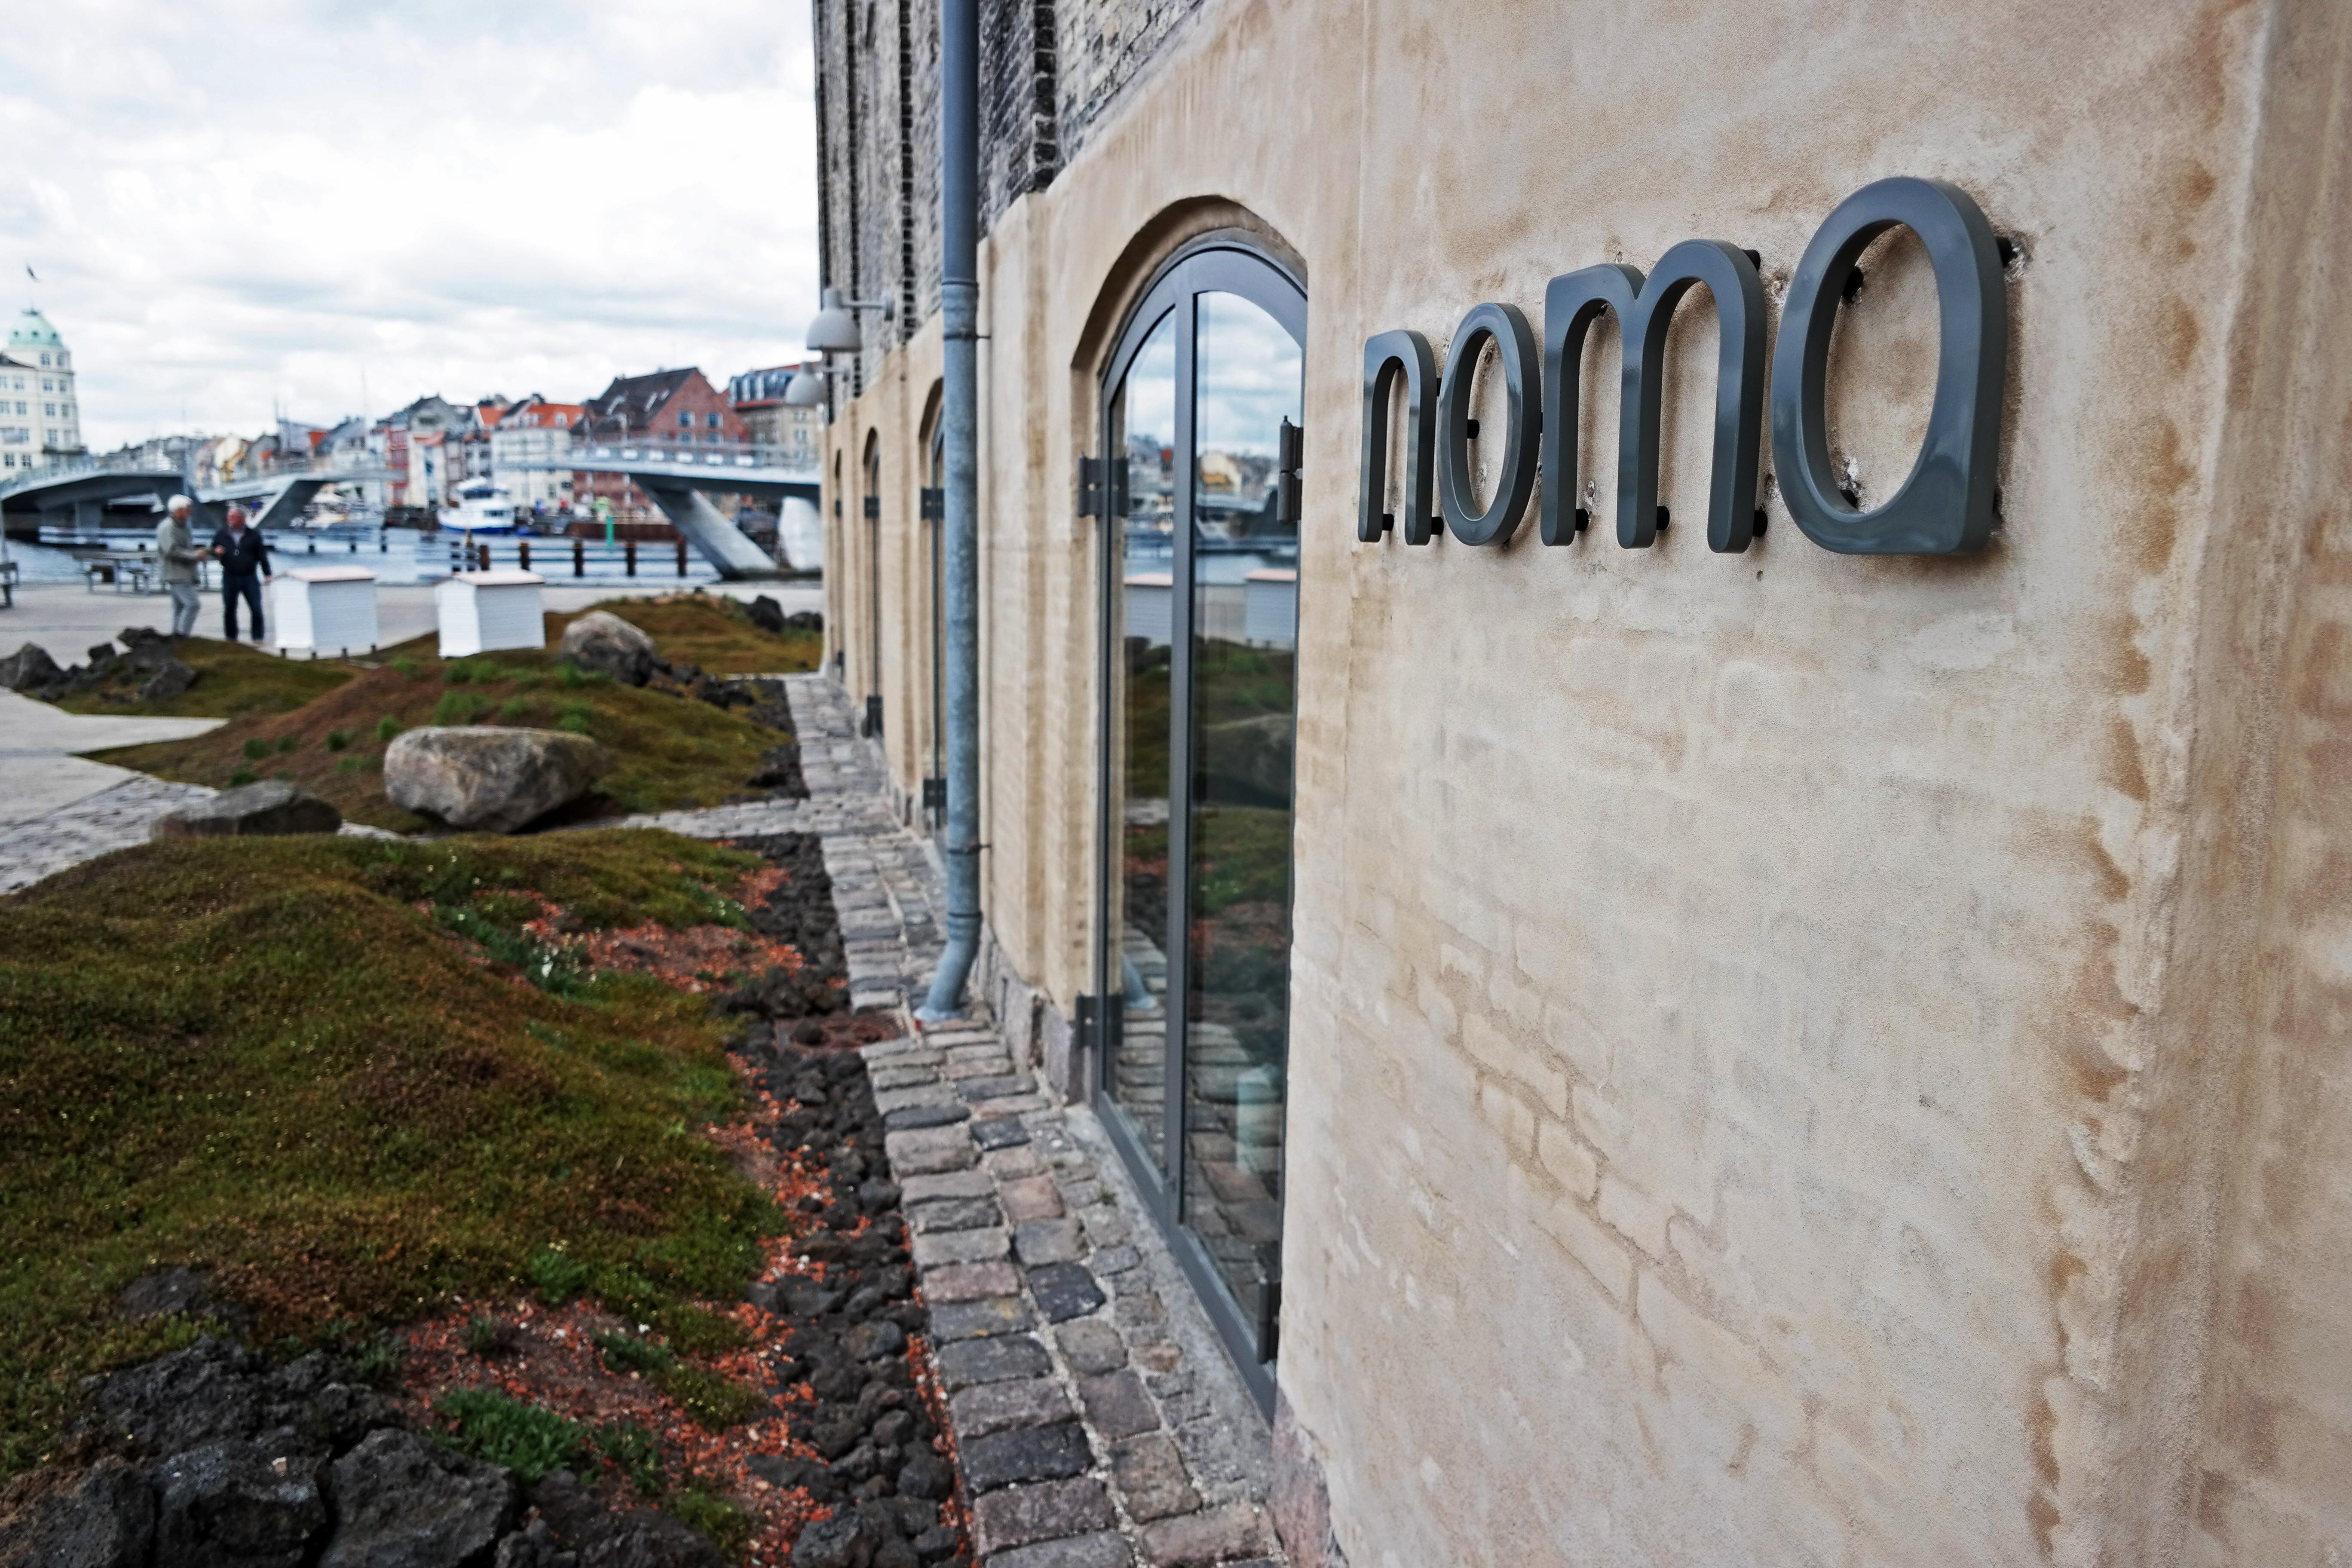 The world's best restaurant  Noma  in Copenhagen on May 5, 2014.